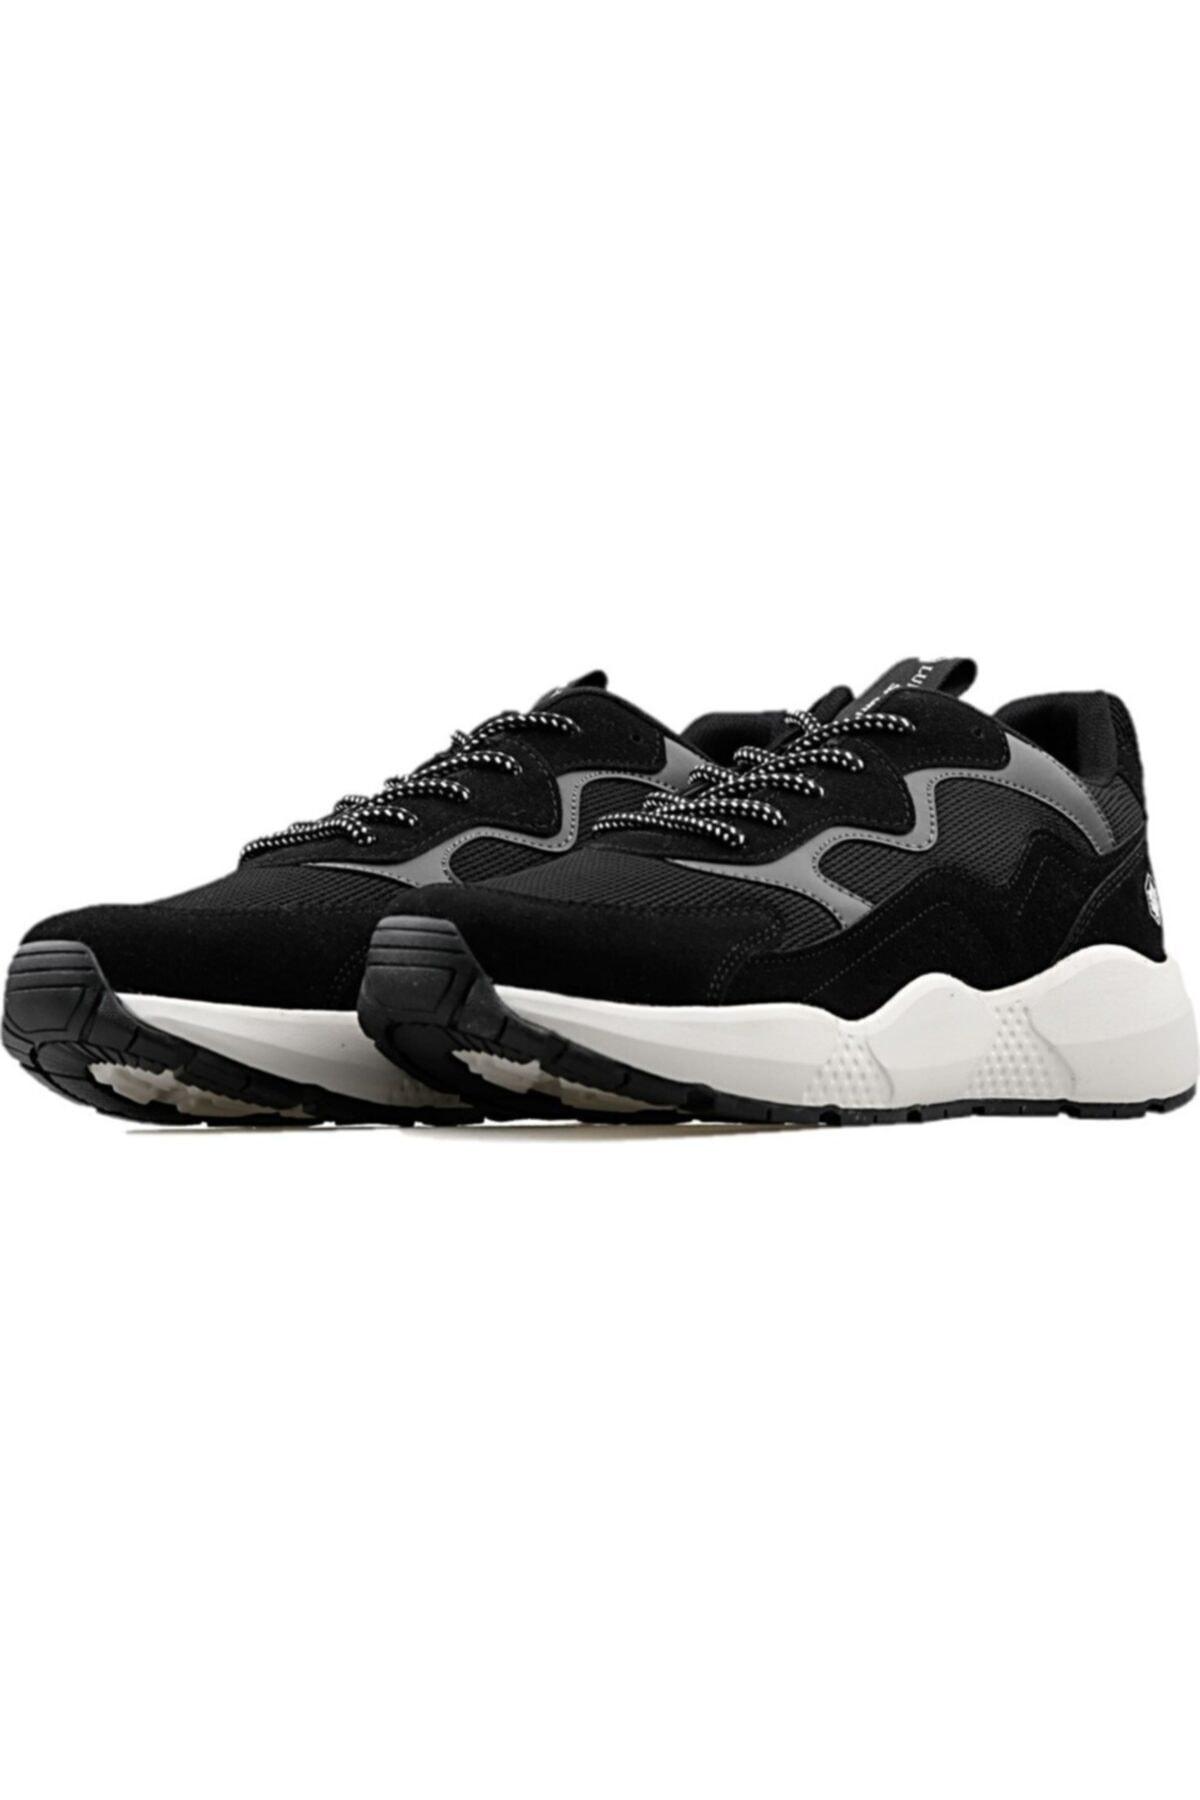 lumberjack VALENTIN Siyah Erkek Sneaker Ayakkabı 100545905 2